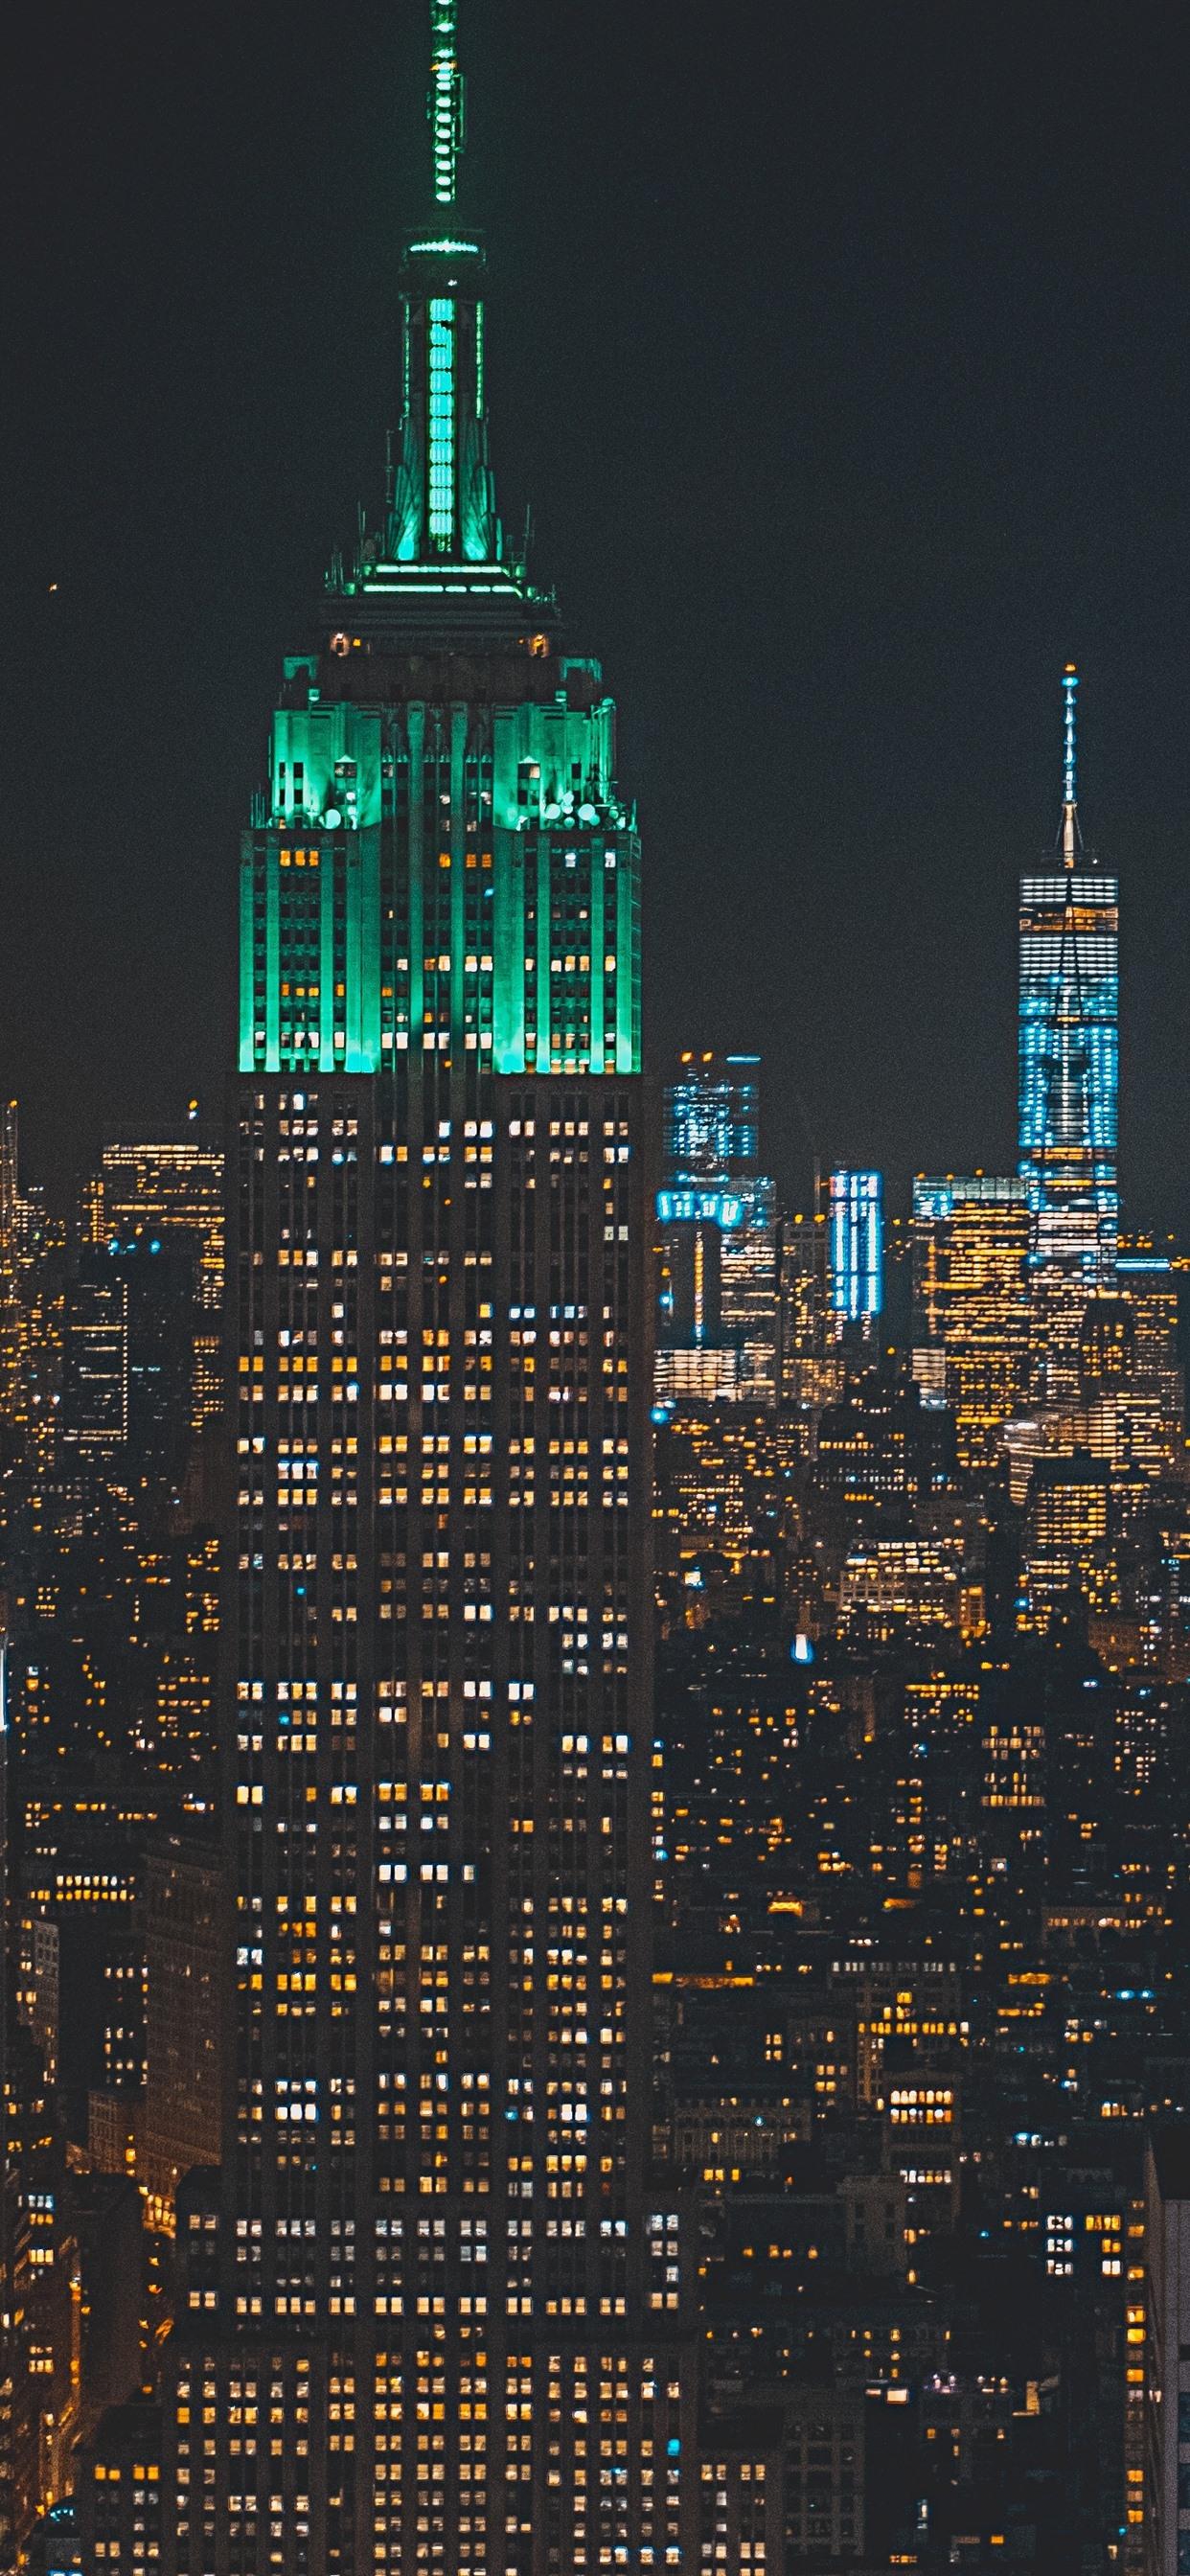 City Night Skyscrapers Buildings Lights 1242x2688 Iphone